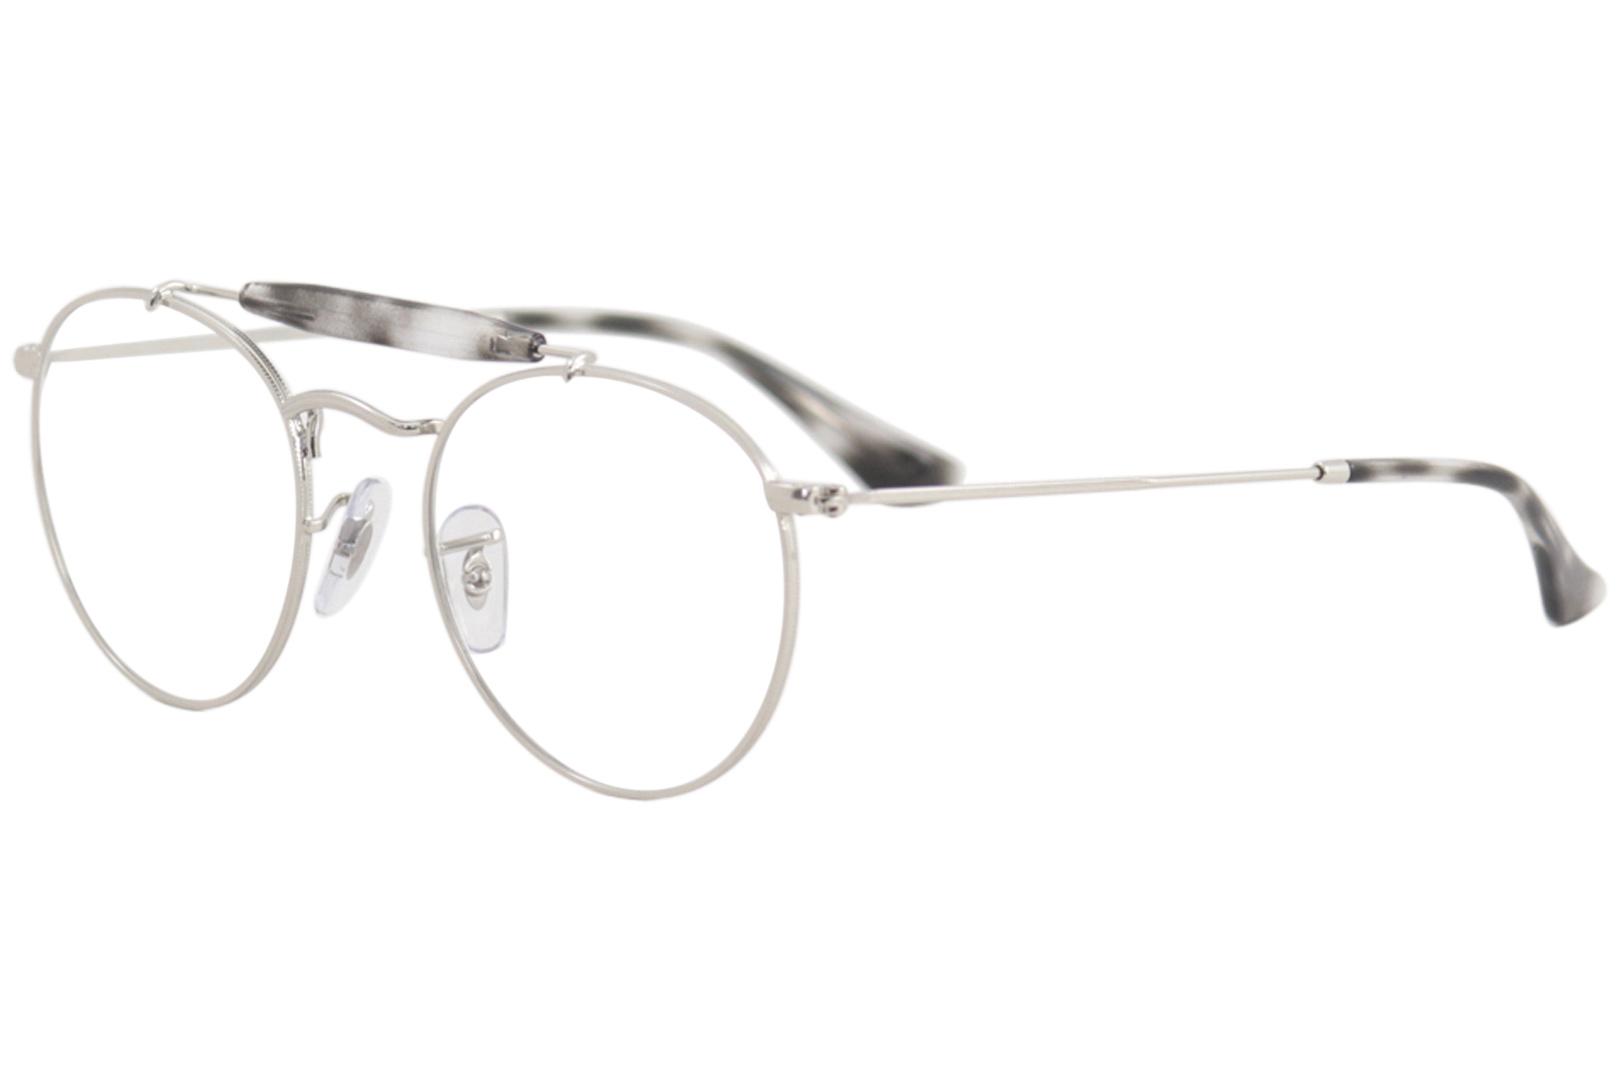 a93b8e65437 Ray Ban Men s Eyeglasses RB3747V RB 3747 V 2501 Silver RayBan ...